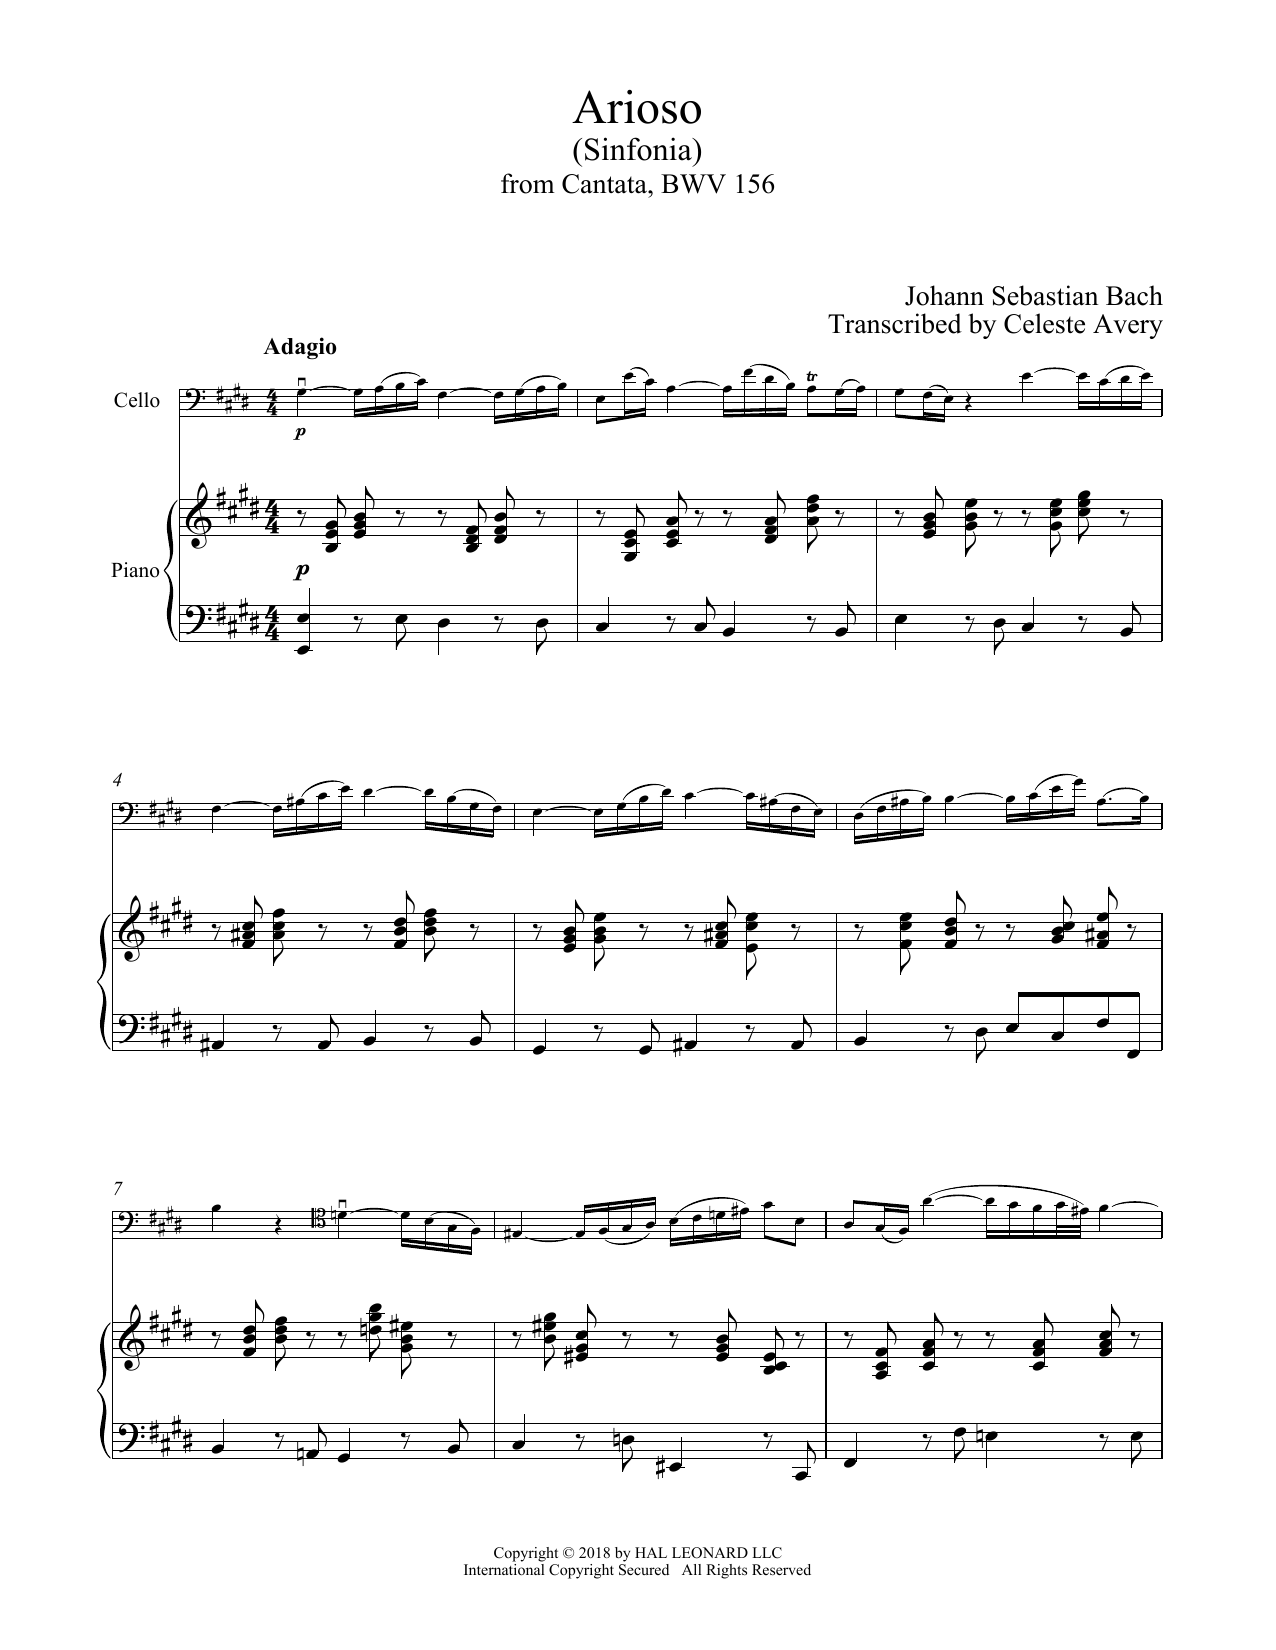 Arioso (Cello and Piano)